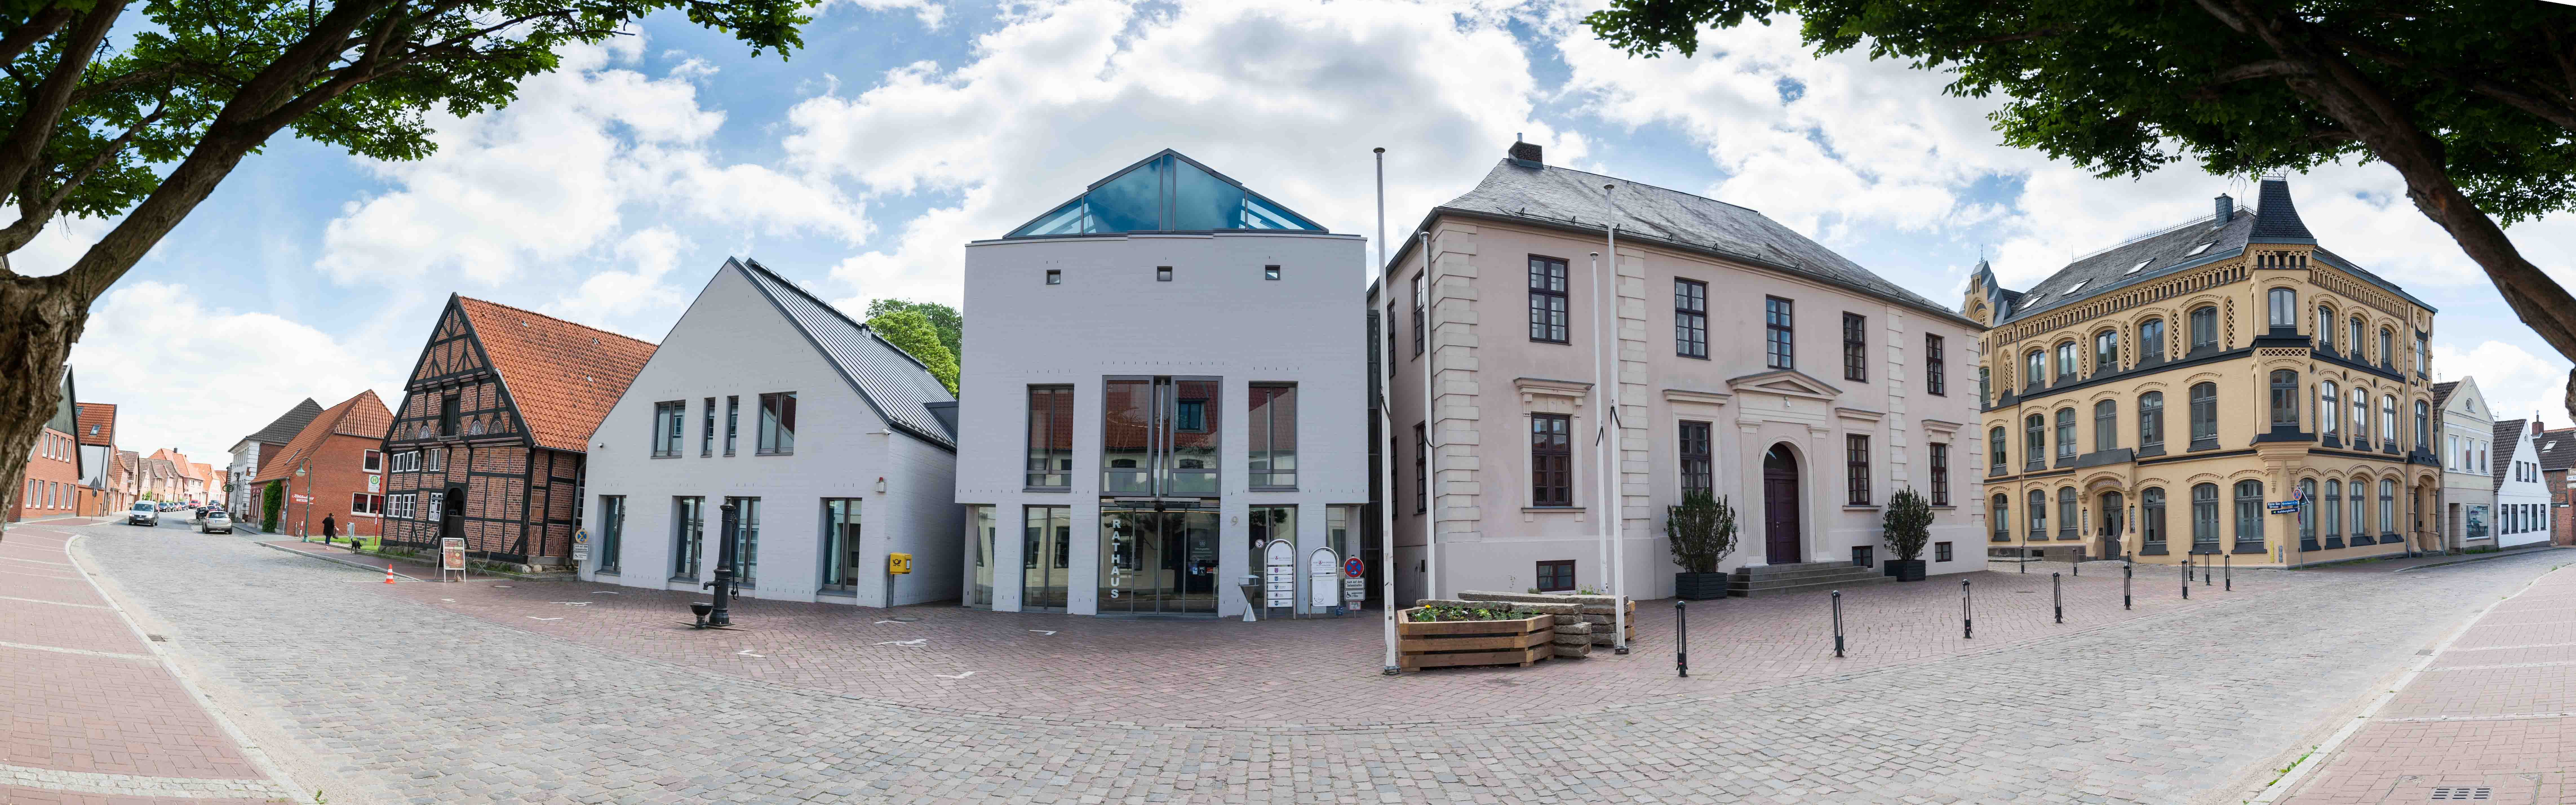 Rathaus05_2017